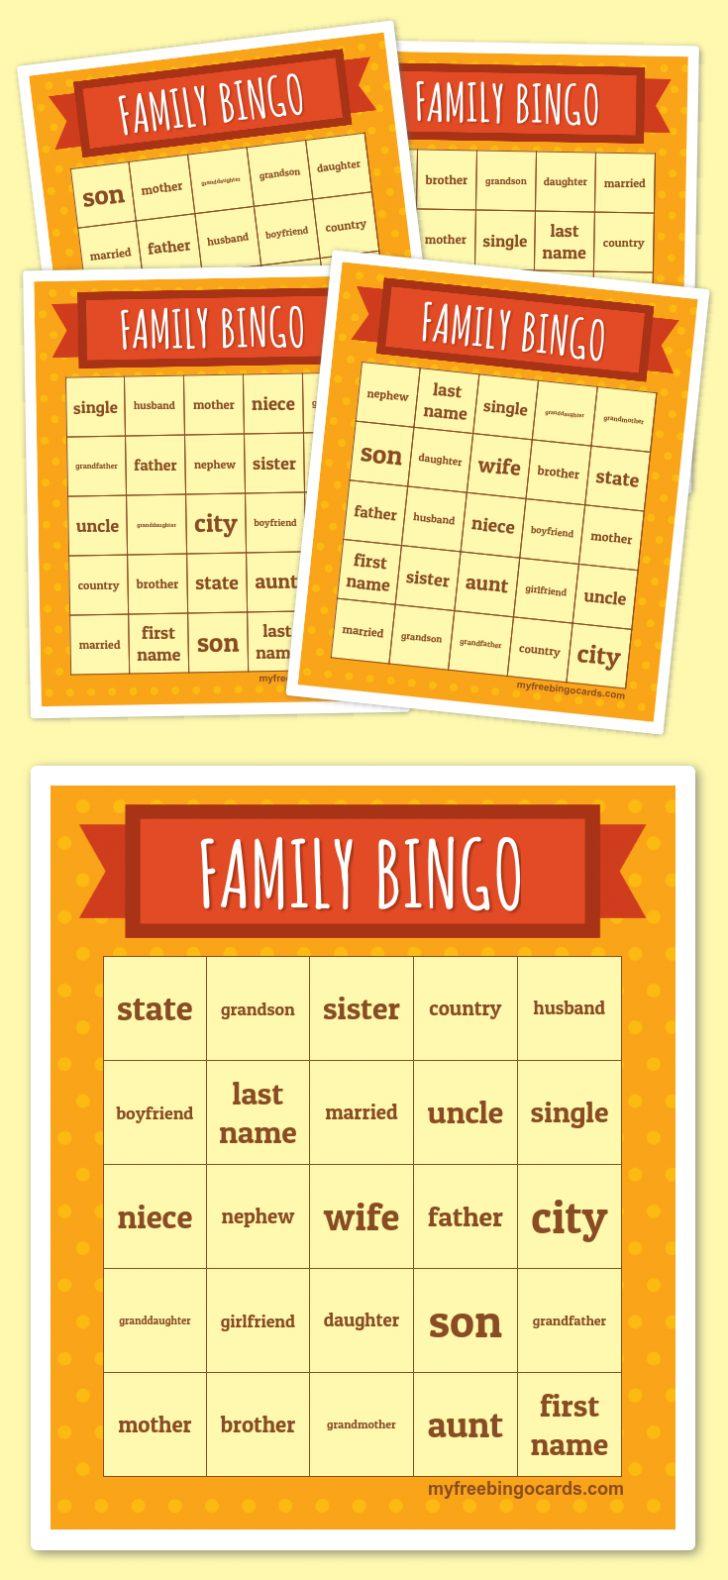 Printable Family Bingo Cards